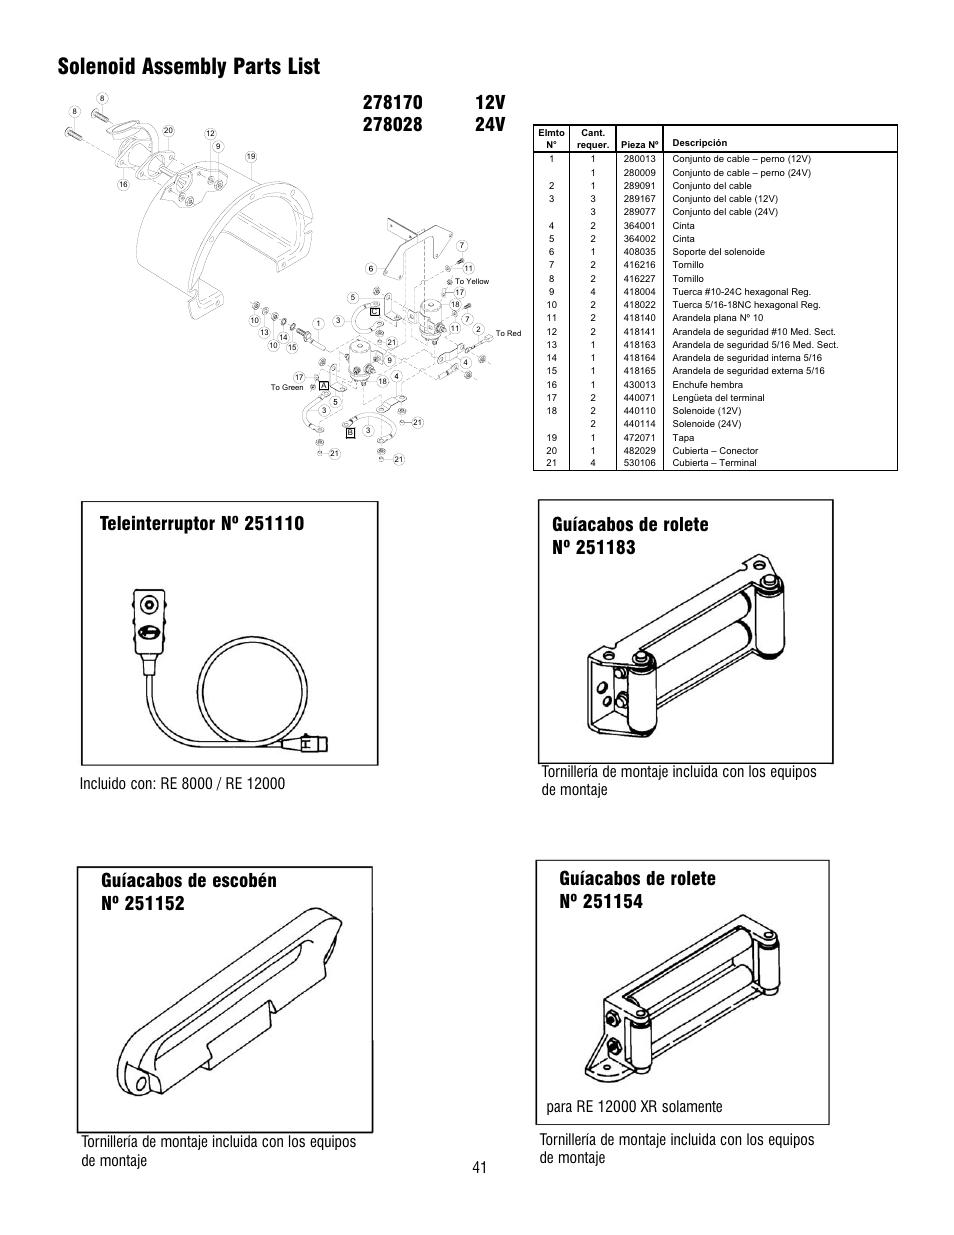 Ramsey Winch Solenoid 278170 - 1960 ramsey winch diagrams ... on